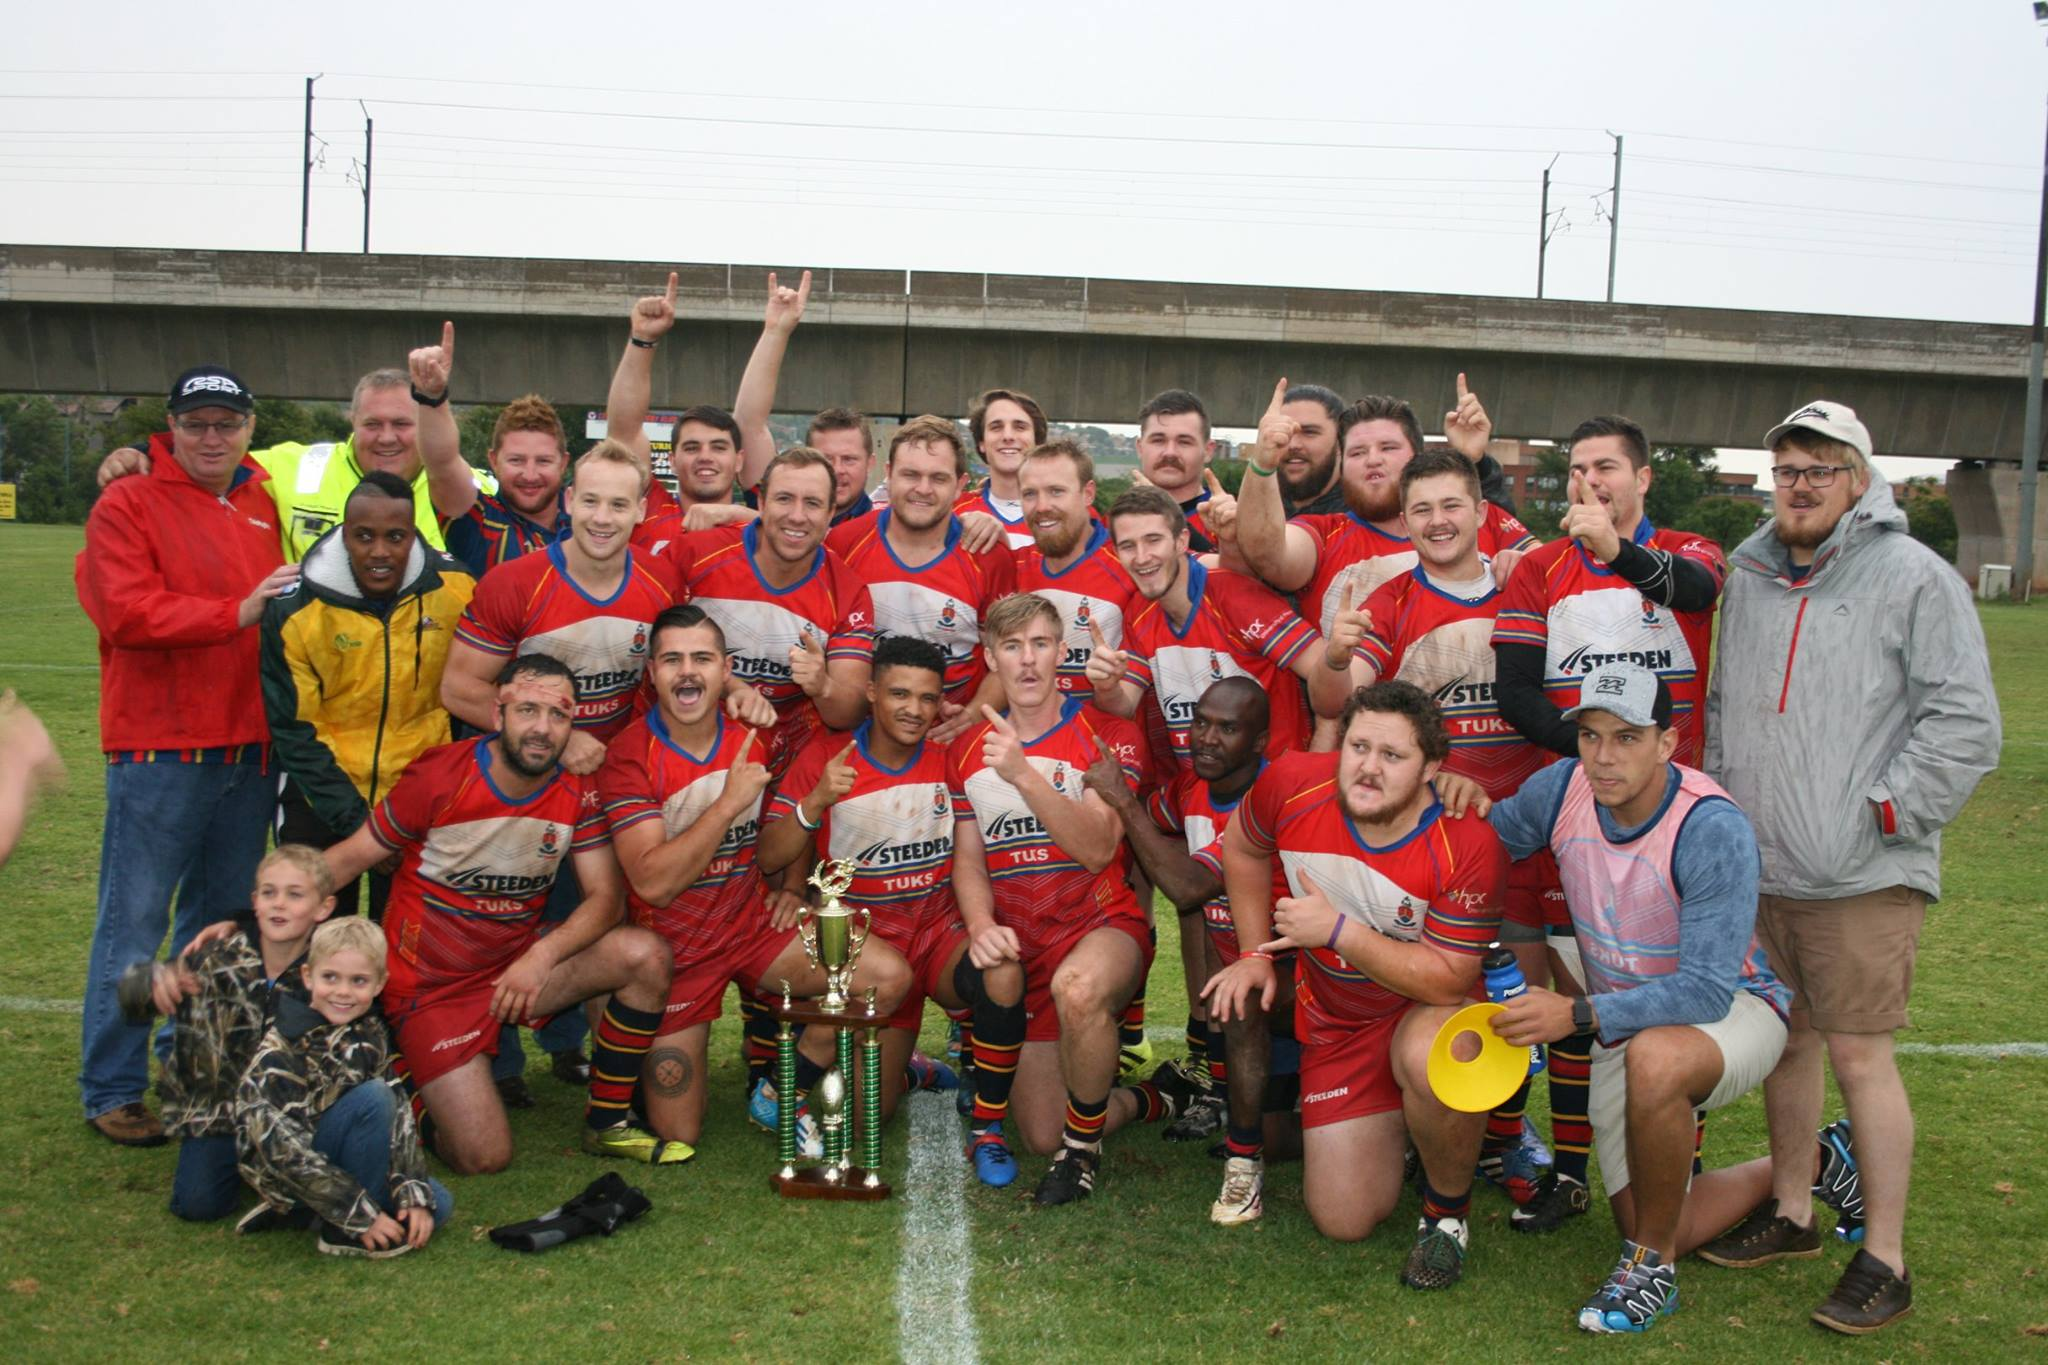 University of Pretoria Red to face Blue in Gauteng Rhino Cup Final